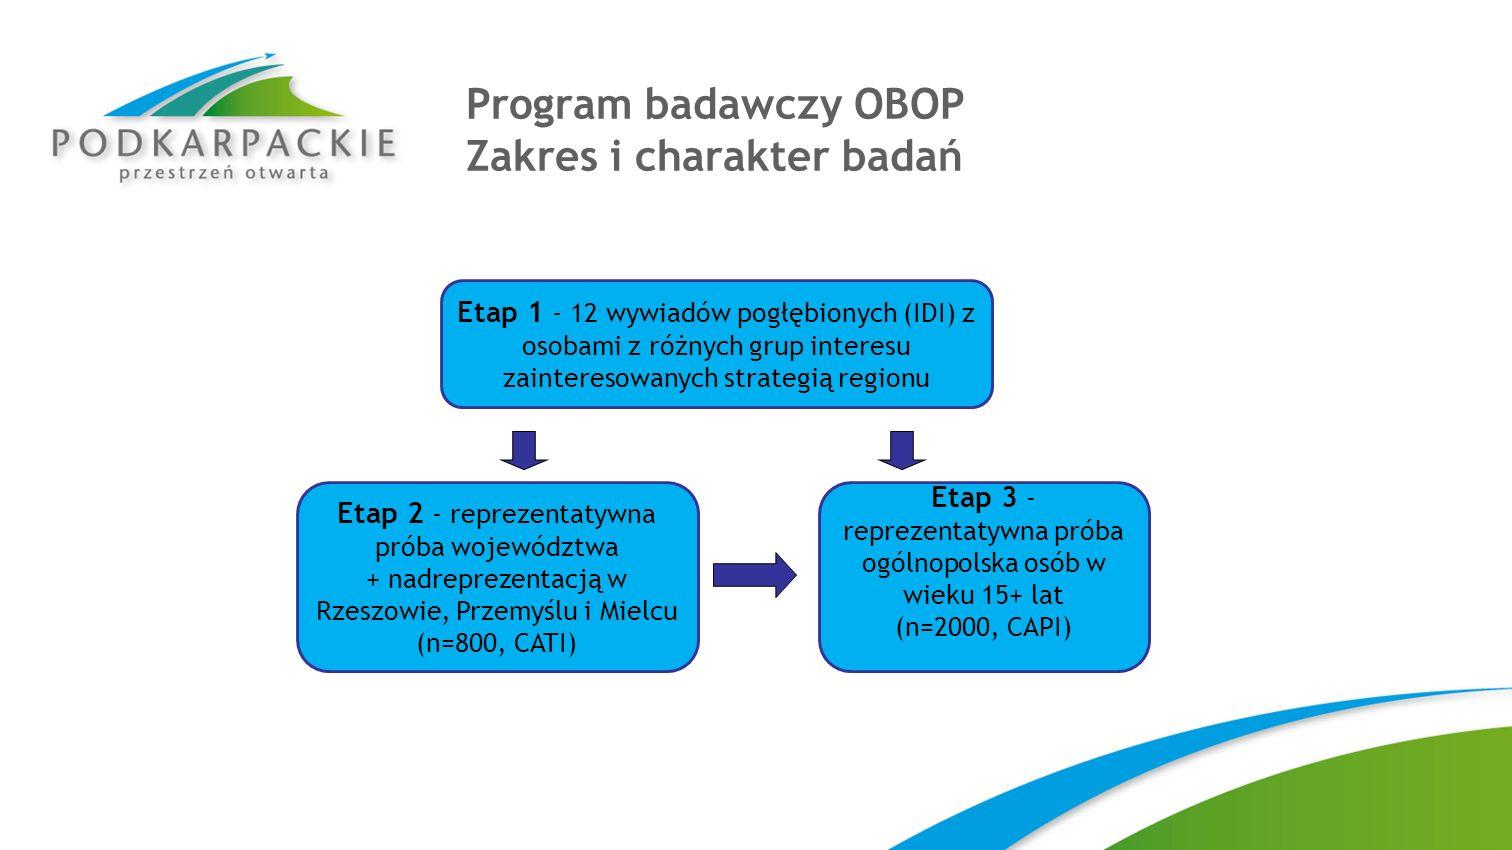 Program badawczy OBOP Zakres i charakter badań